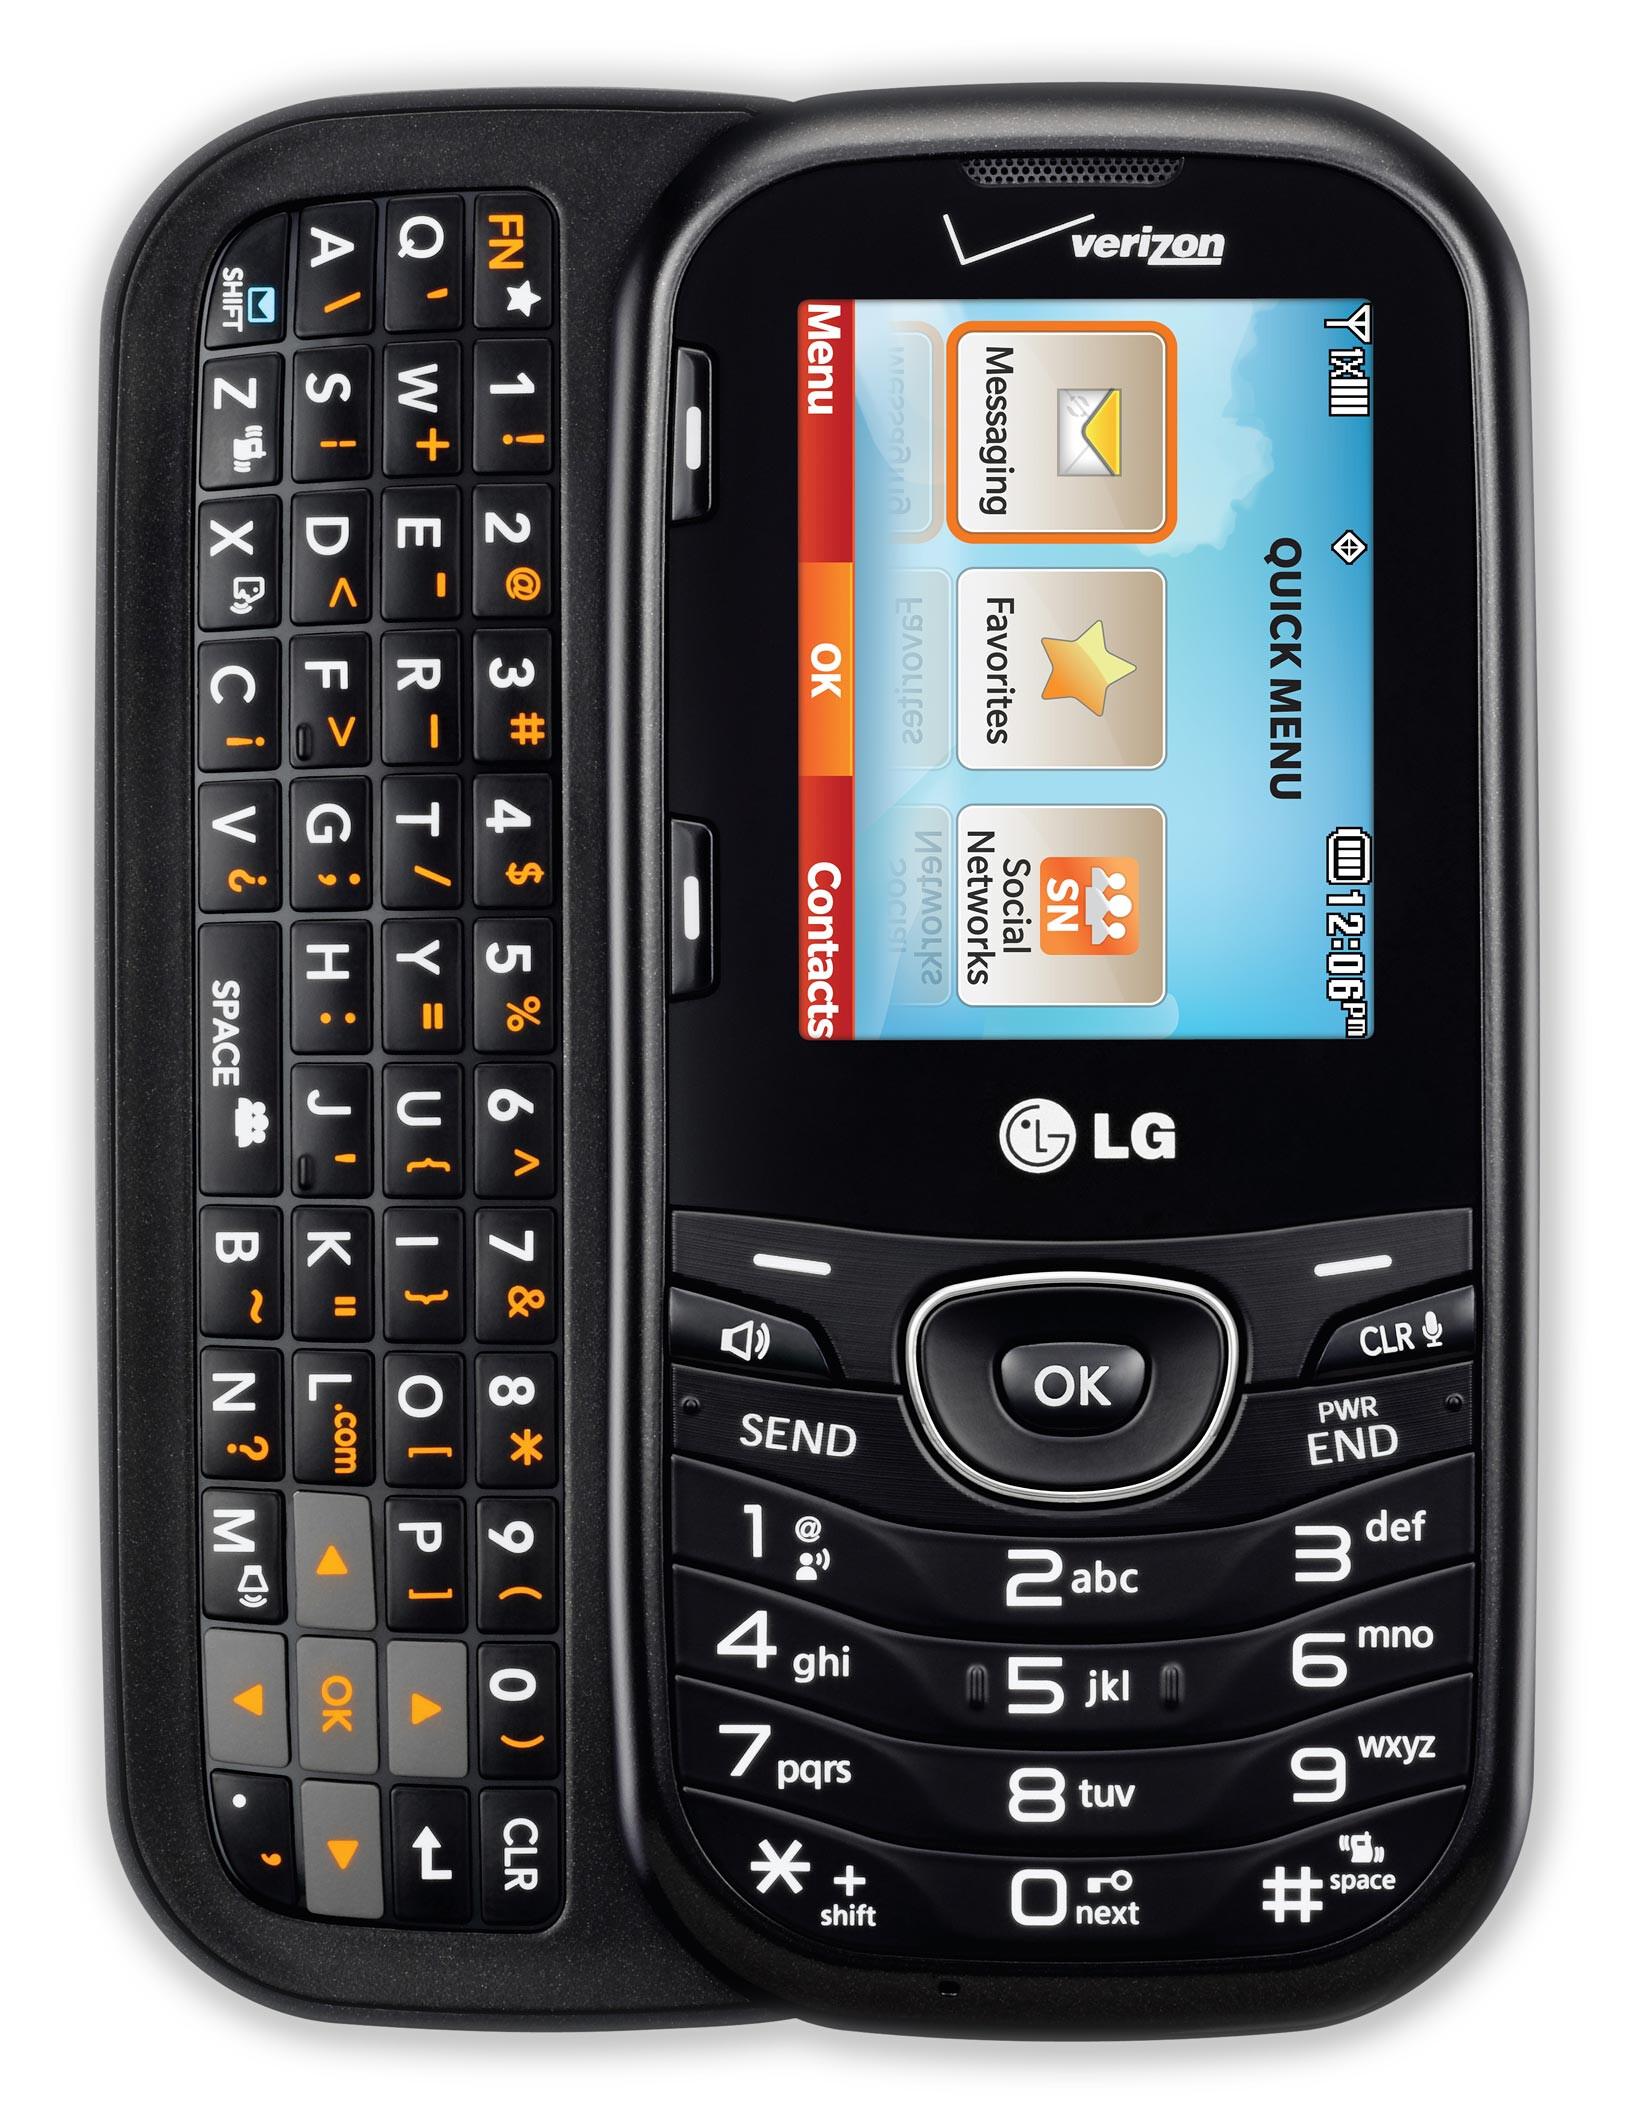 lg cosmos 2 photos rh phonearena com Verizon Wireless LG Cosmos Manual LG Cosmos VN250 User Manual